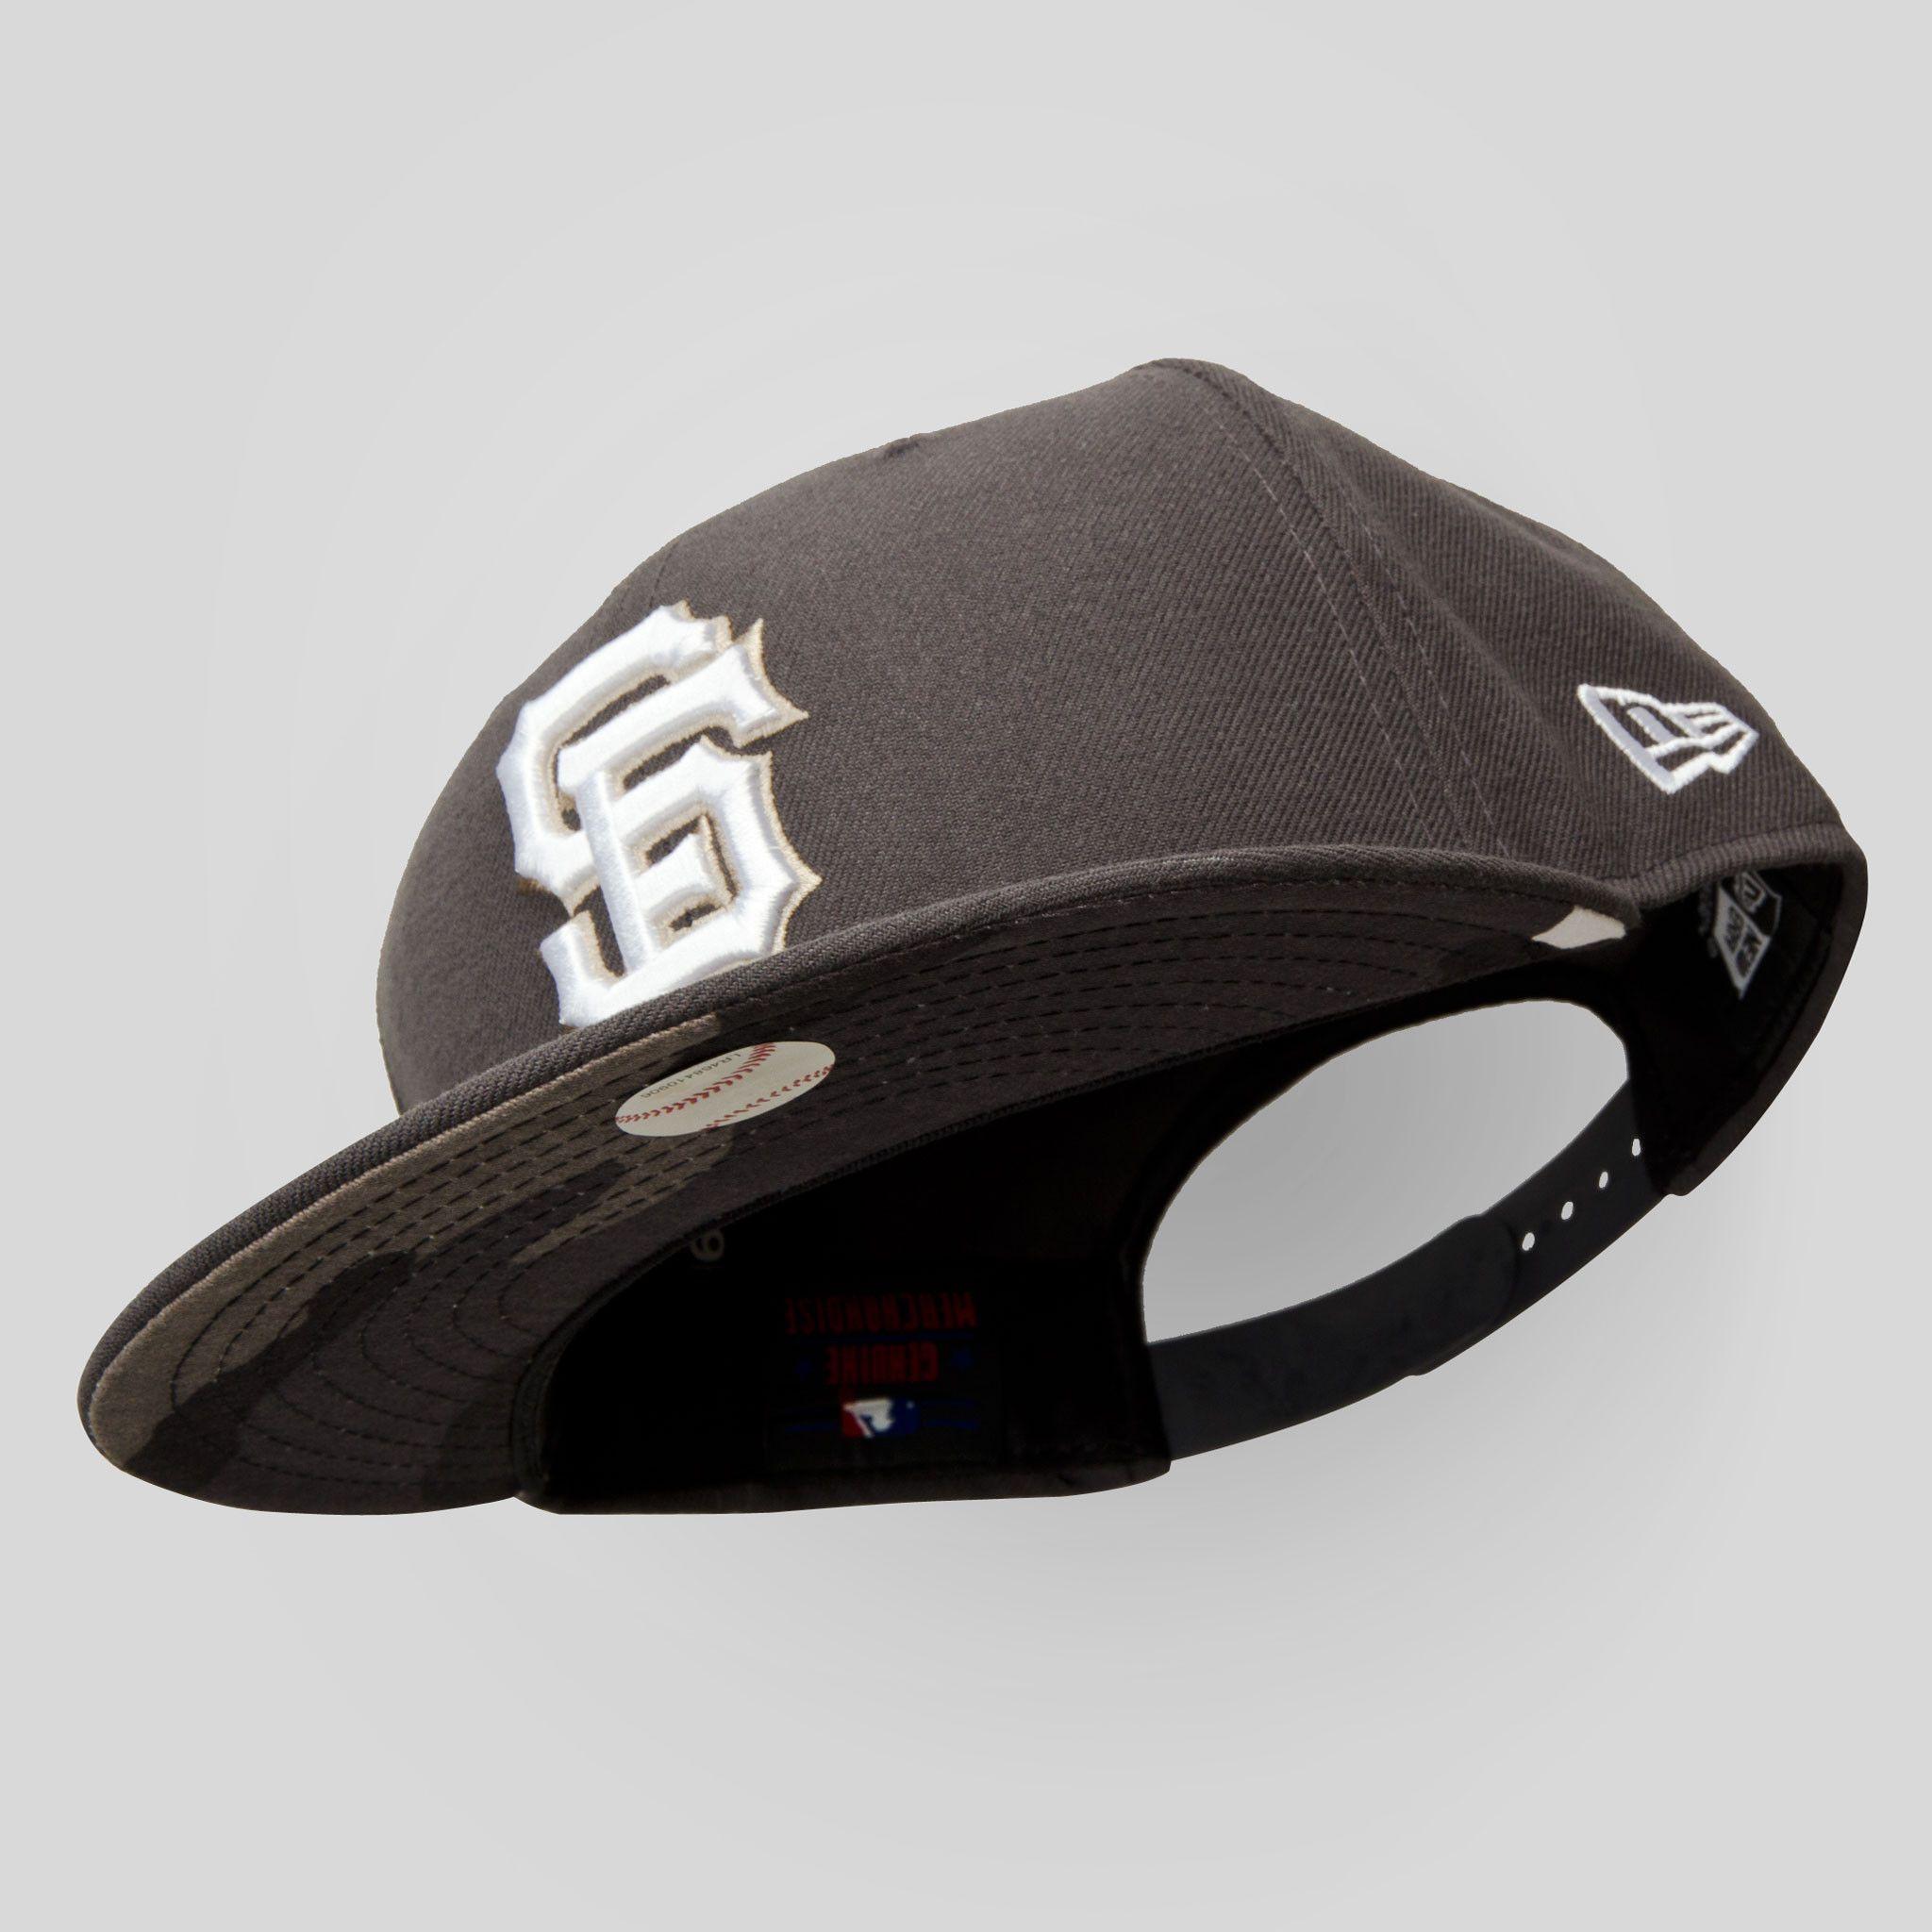 591176904ff SF Giants New Era Snapback Cap in Gray Urban Camo